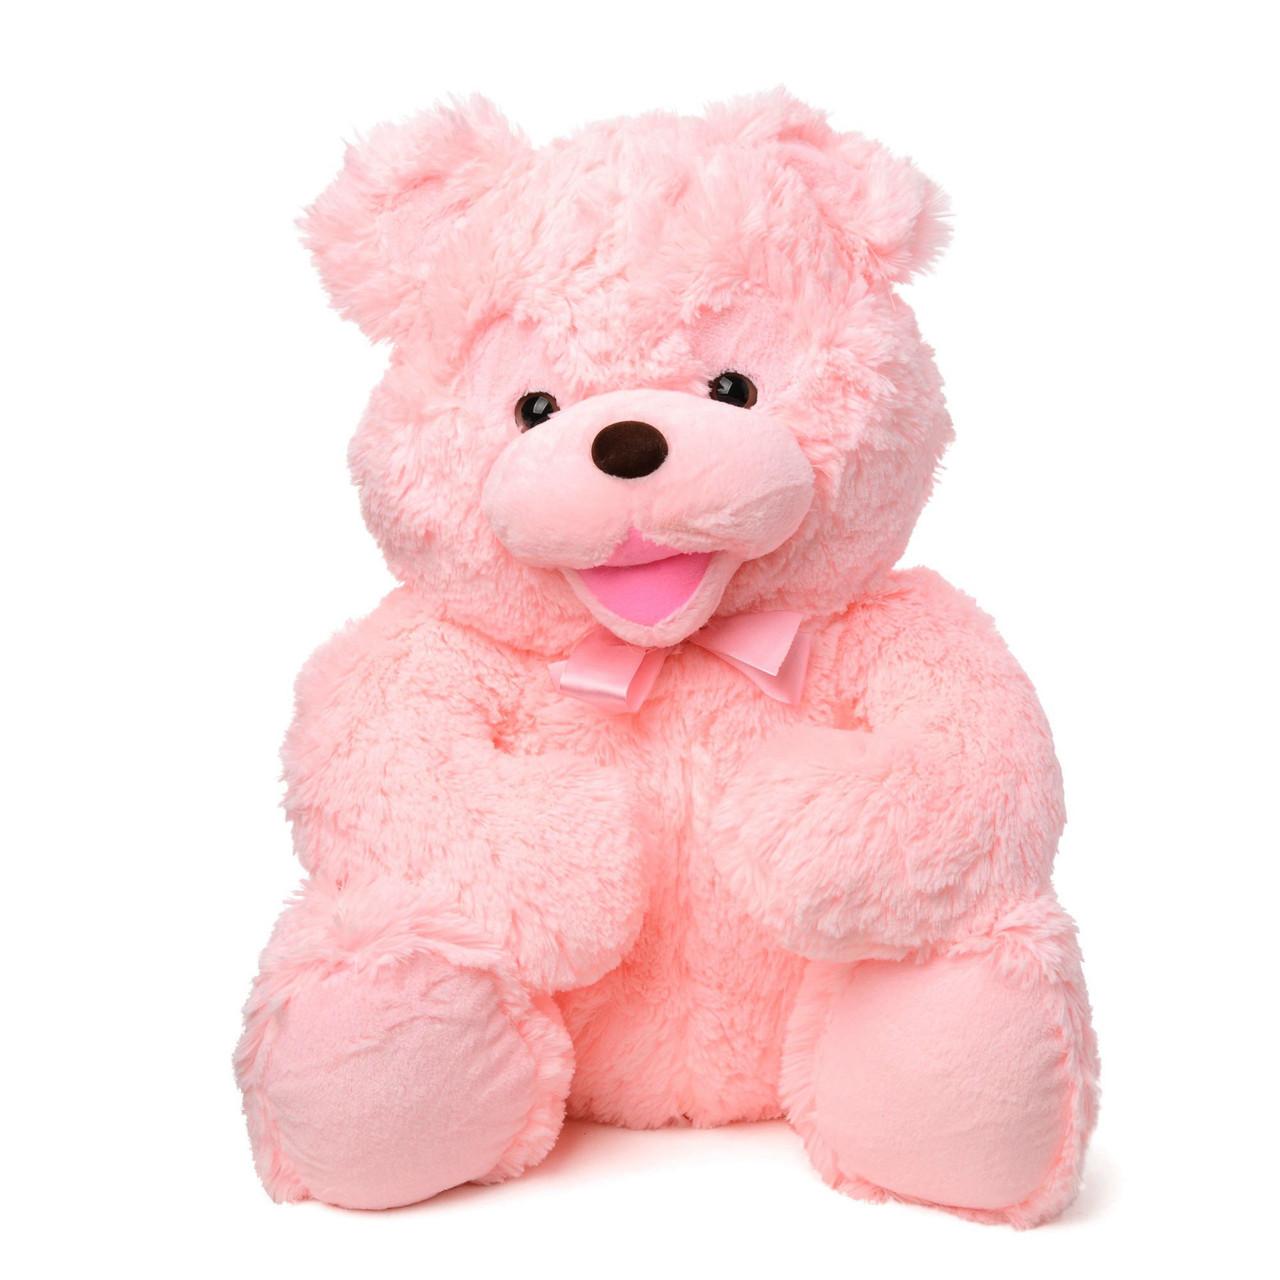 Мягкая игрушка «FANCY» (МДЛ1Р) медведь Лёня, 36 см